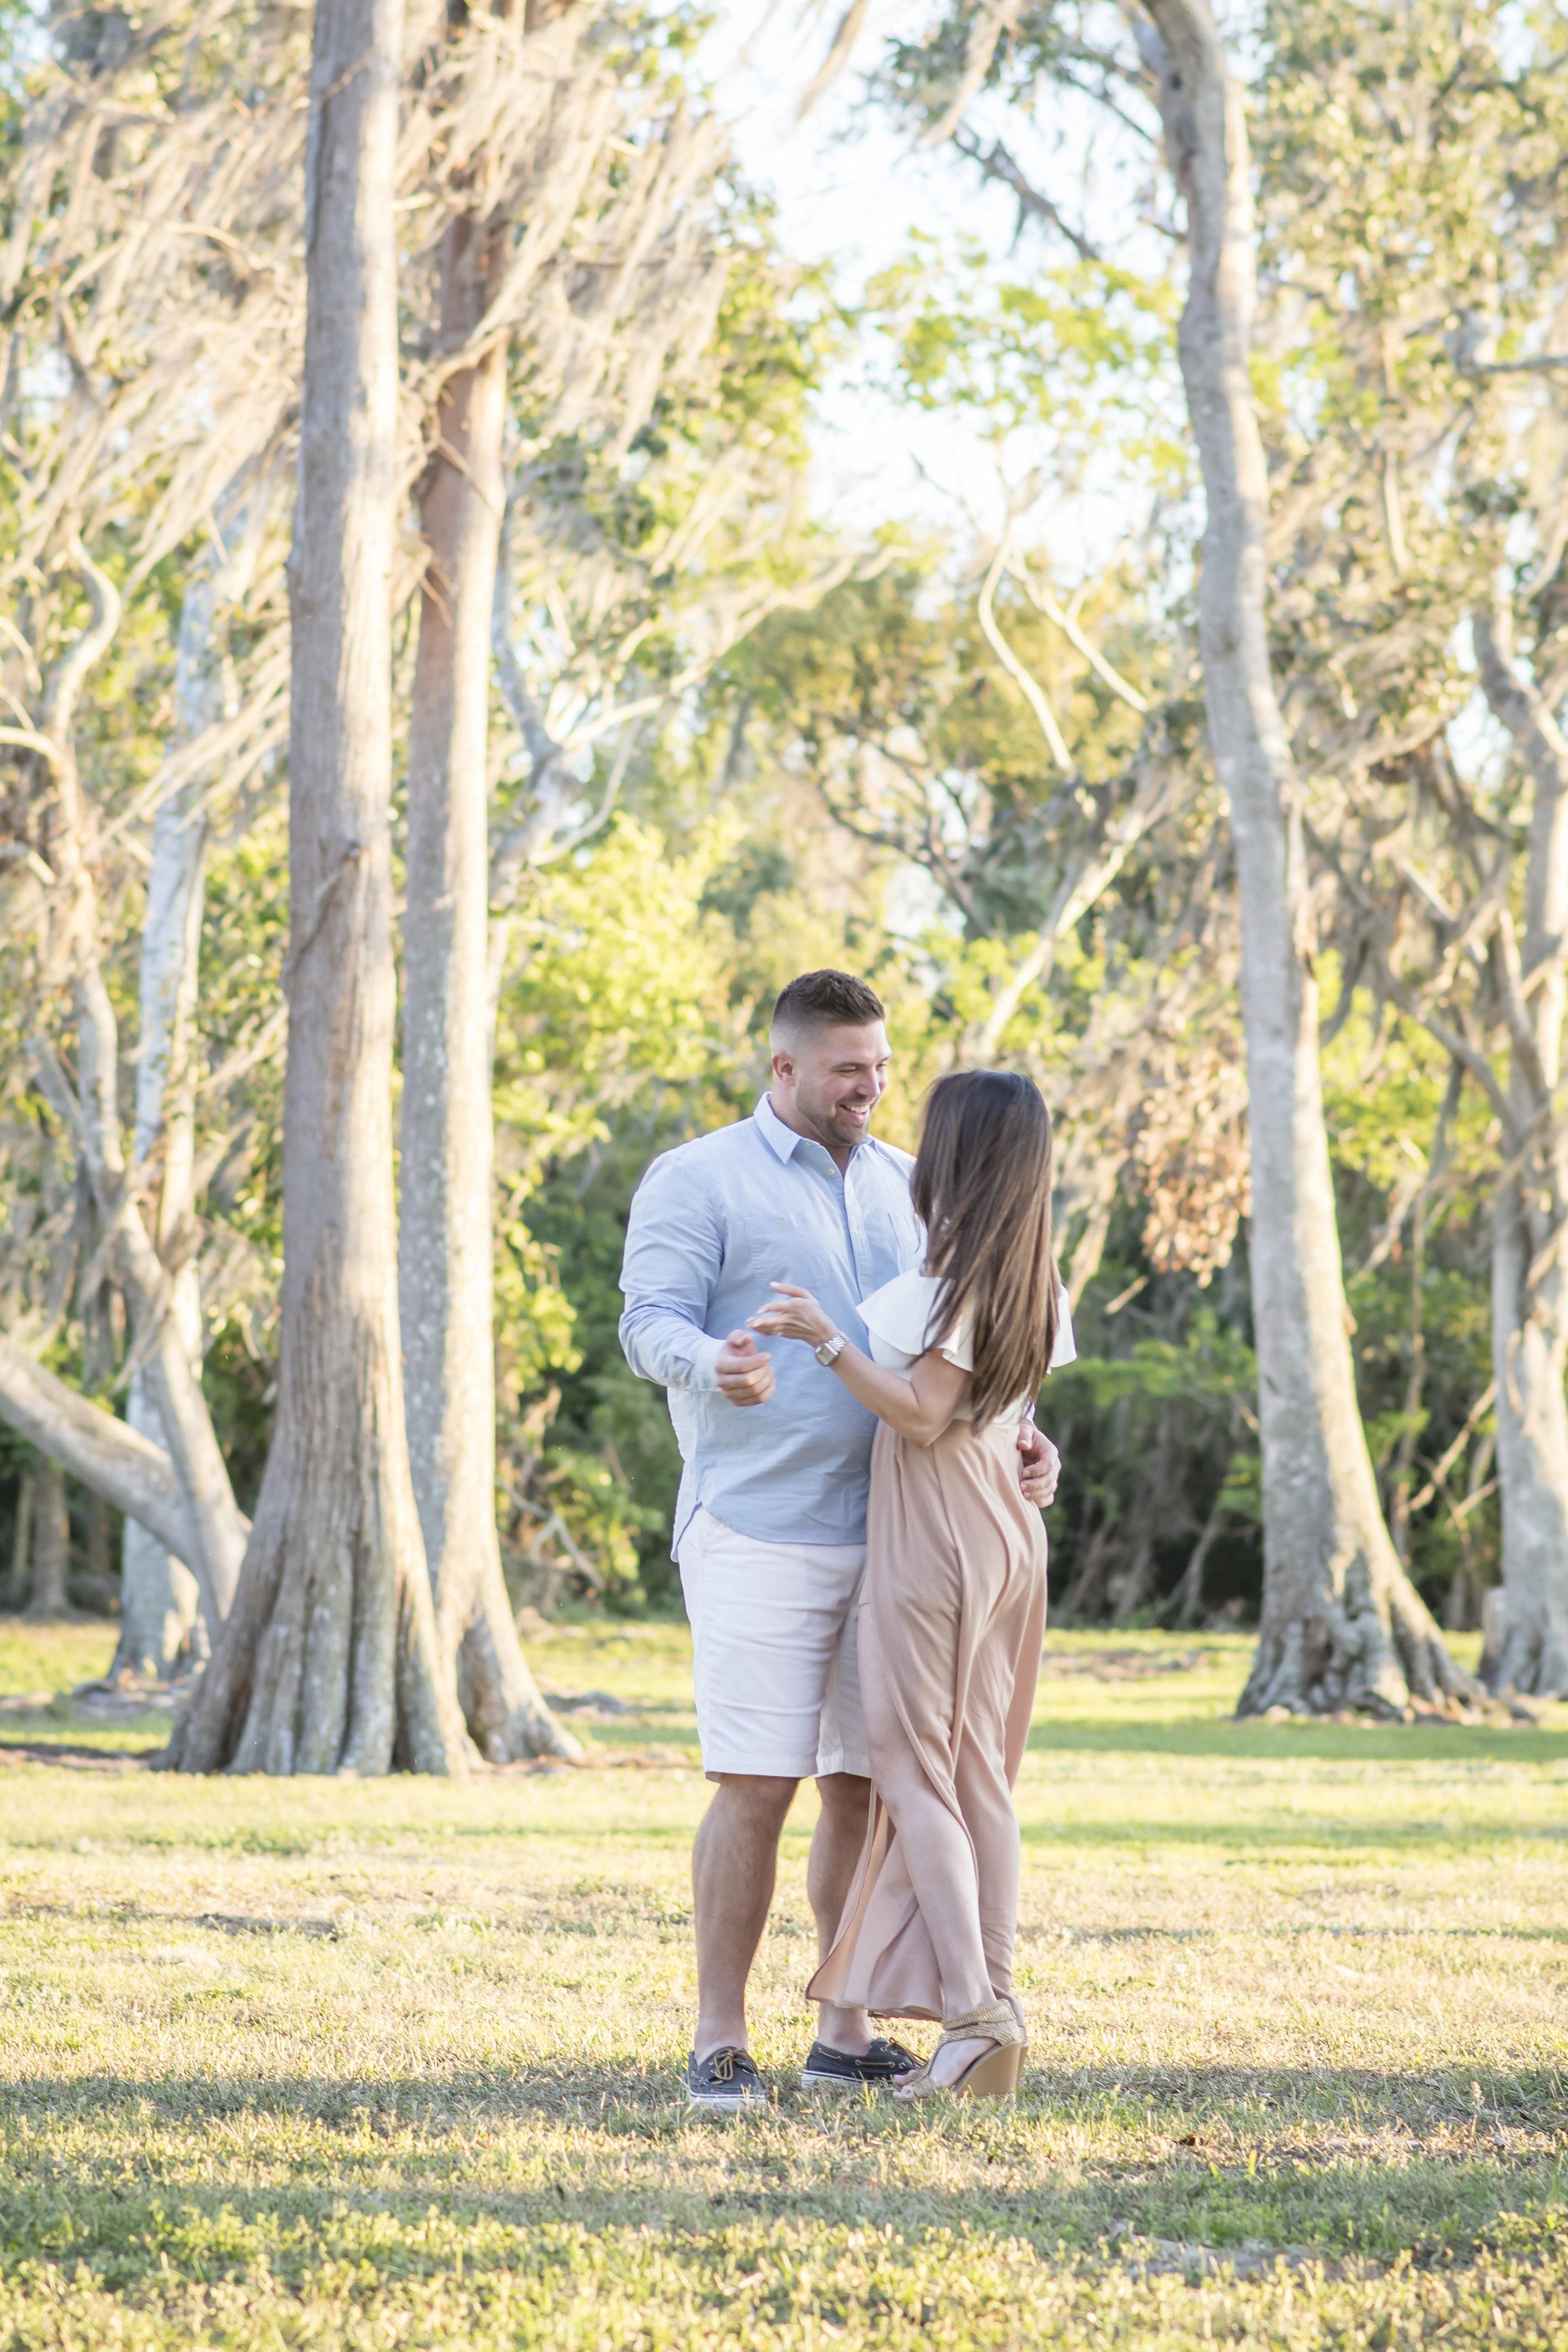 cypress-grove-park-engagement-session-orlando-photographer-yanitza-ninett-16.jpg